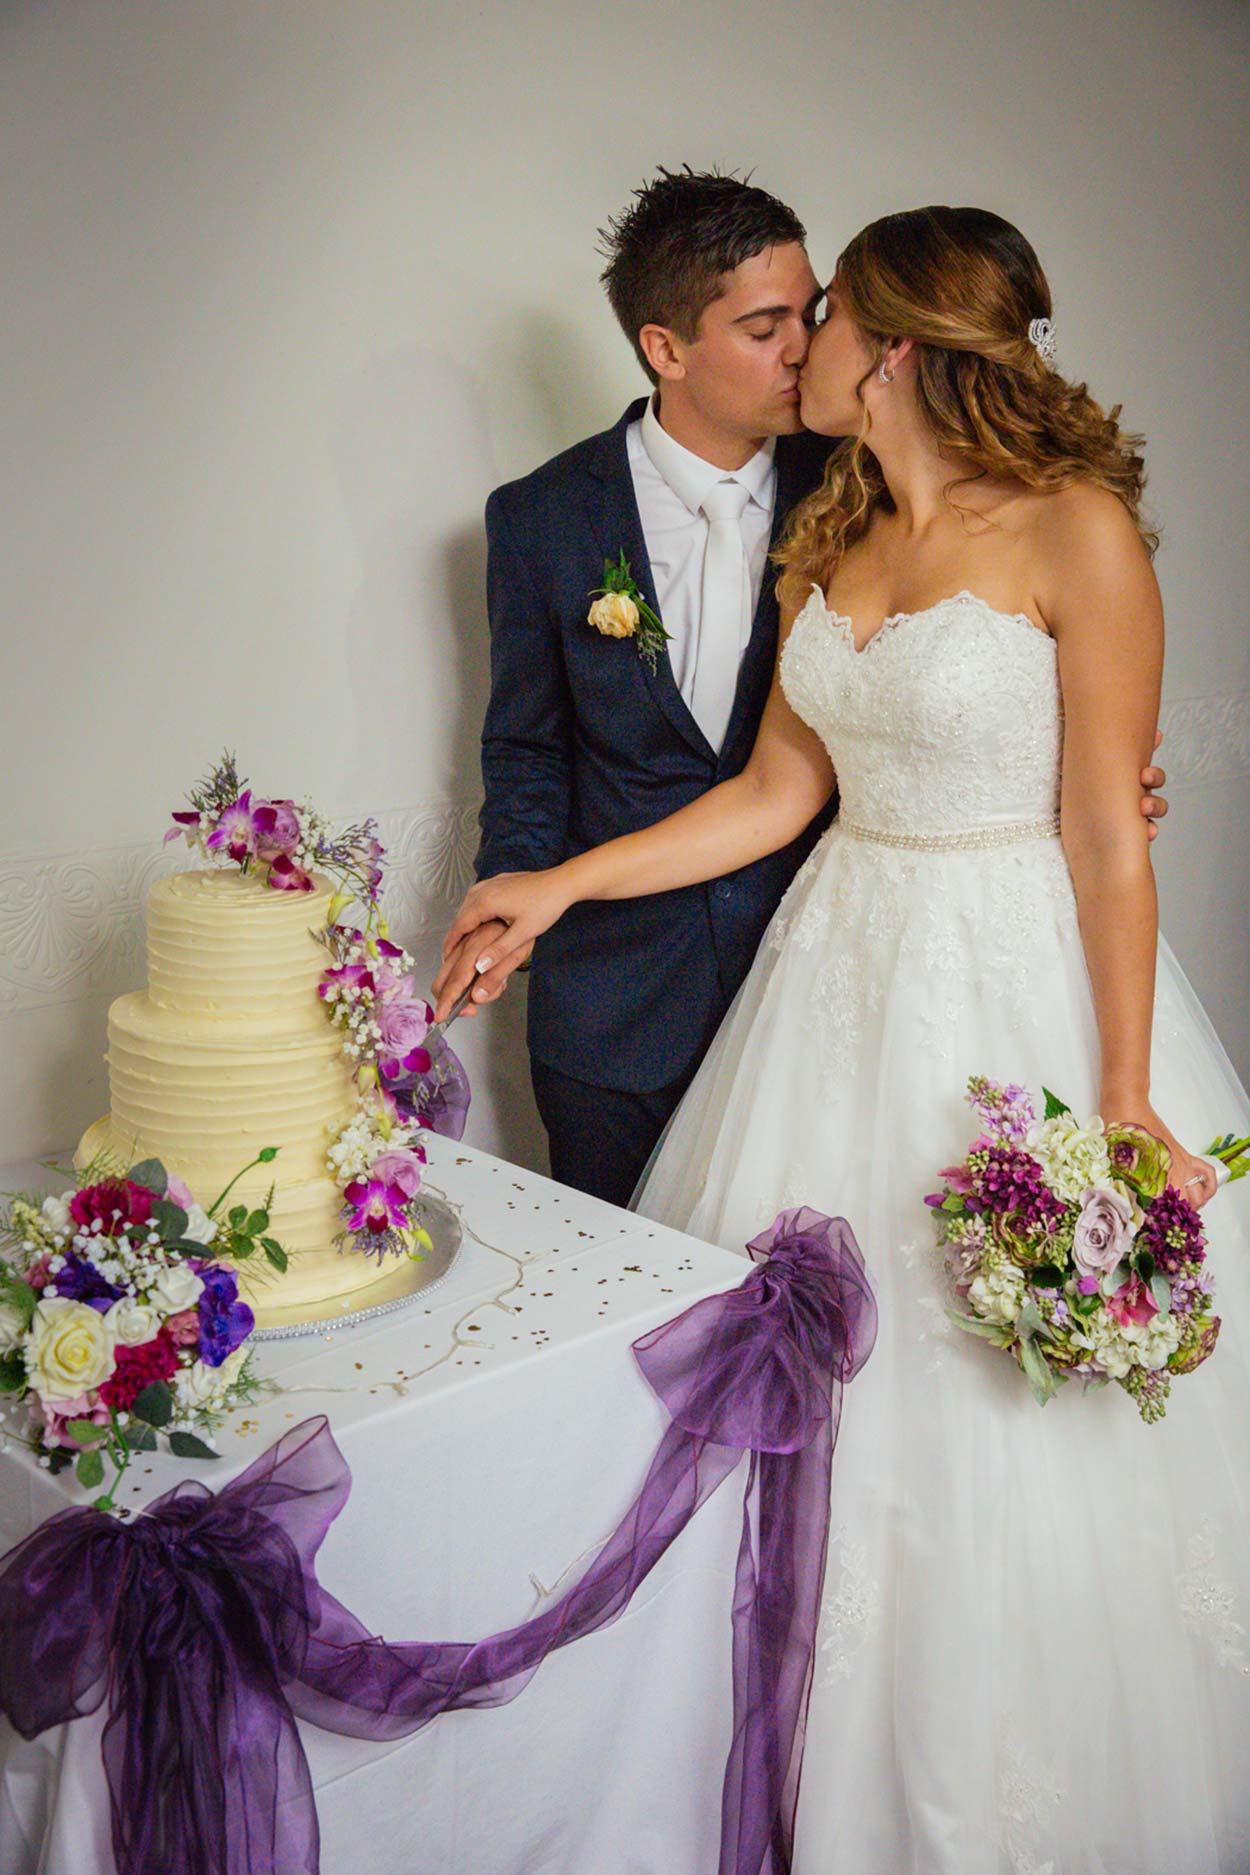 sunshine-coast-destination-wedding-photographers-brisbane-queensland-australian-maleny-noosa-beach-hinterland-montville-flaxton-gold-caloundra-elopement-photos-best-recommended-eco-friendly-packages-114.jpg